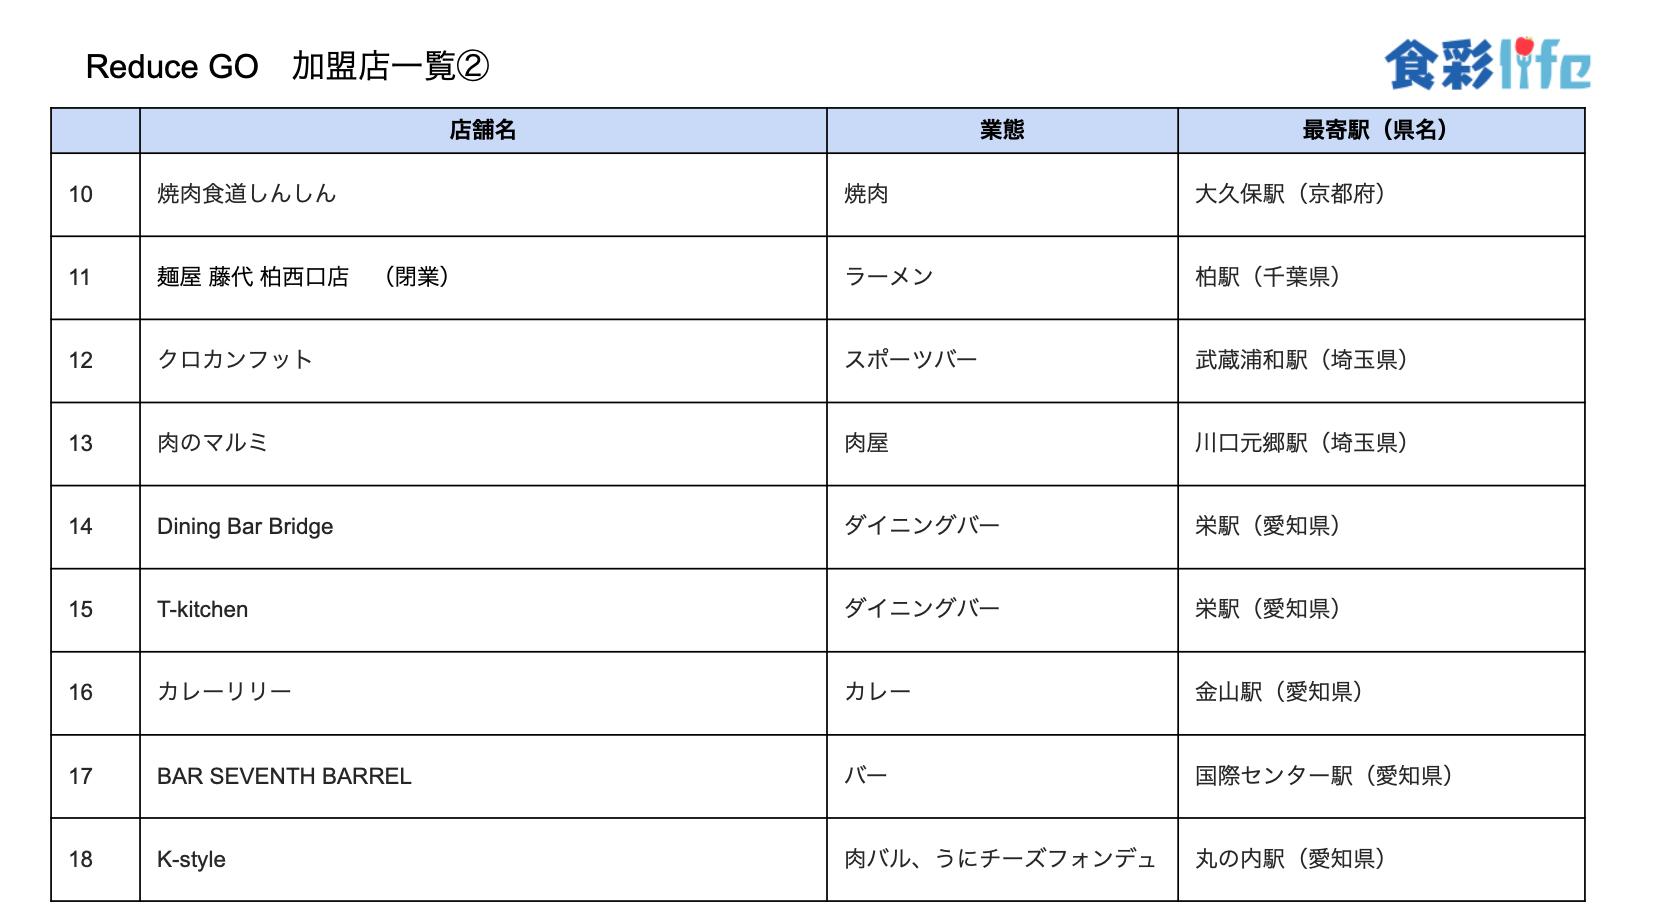 「ReduceGo」加盟店一覧2 (2020.3.18)